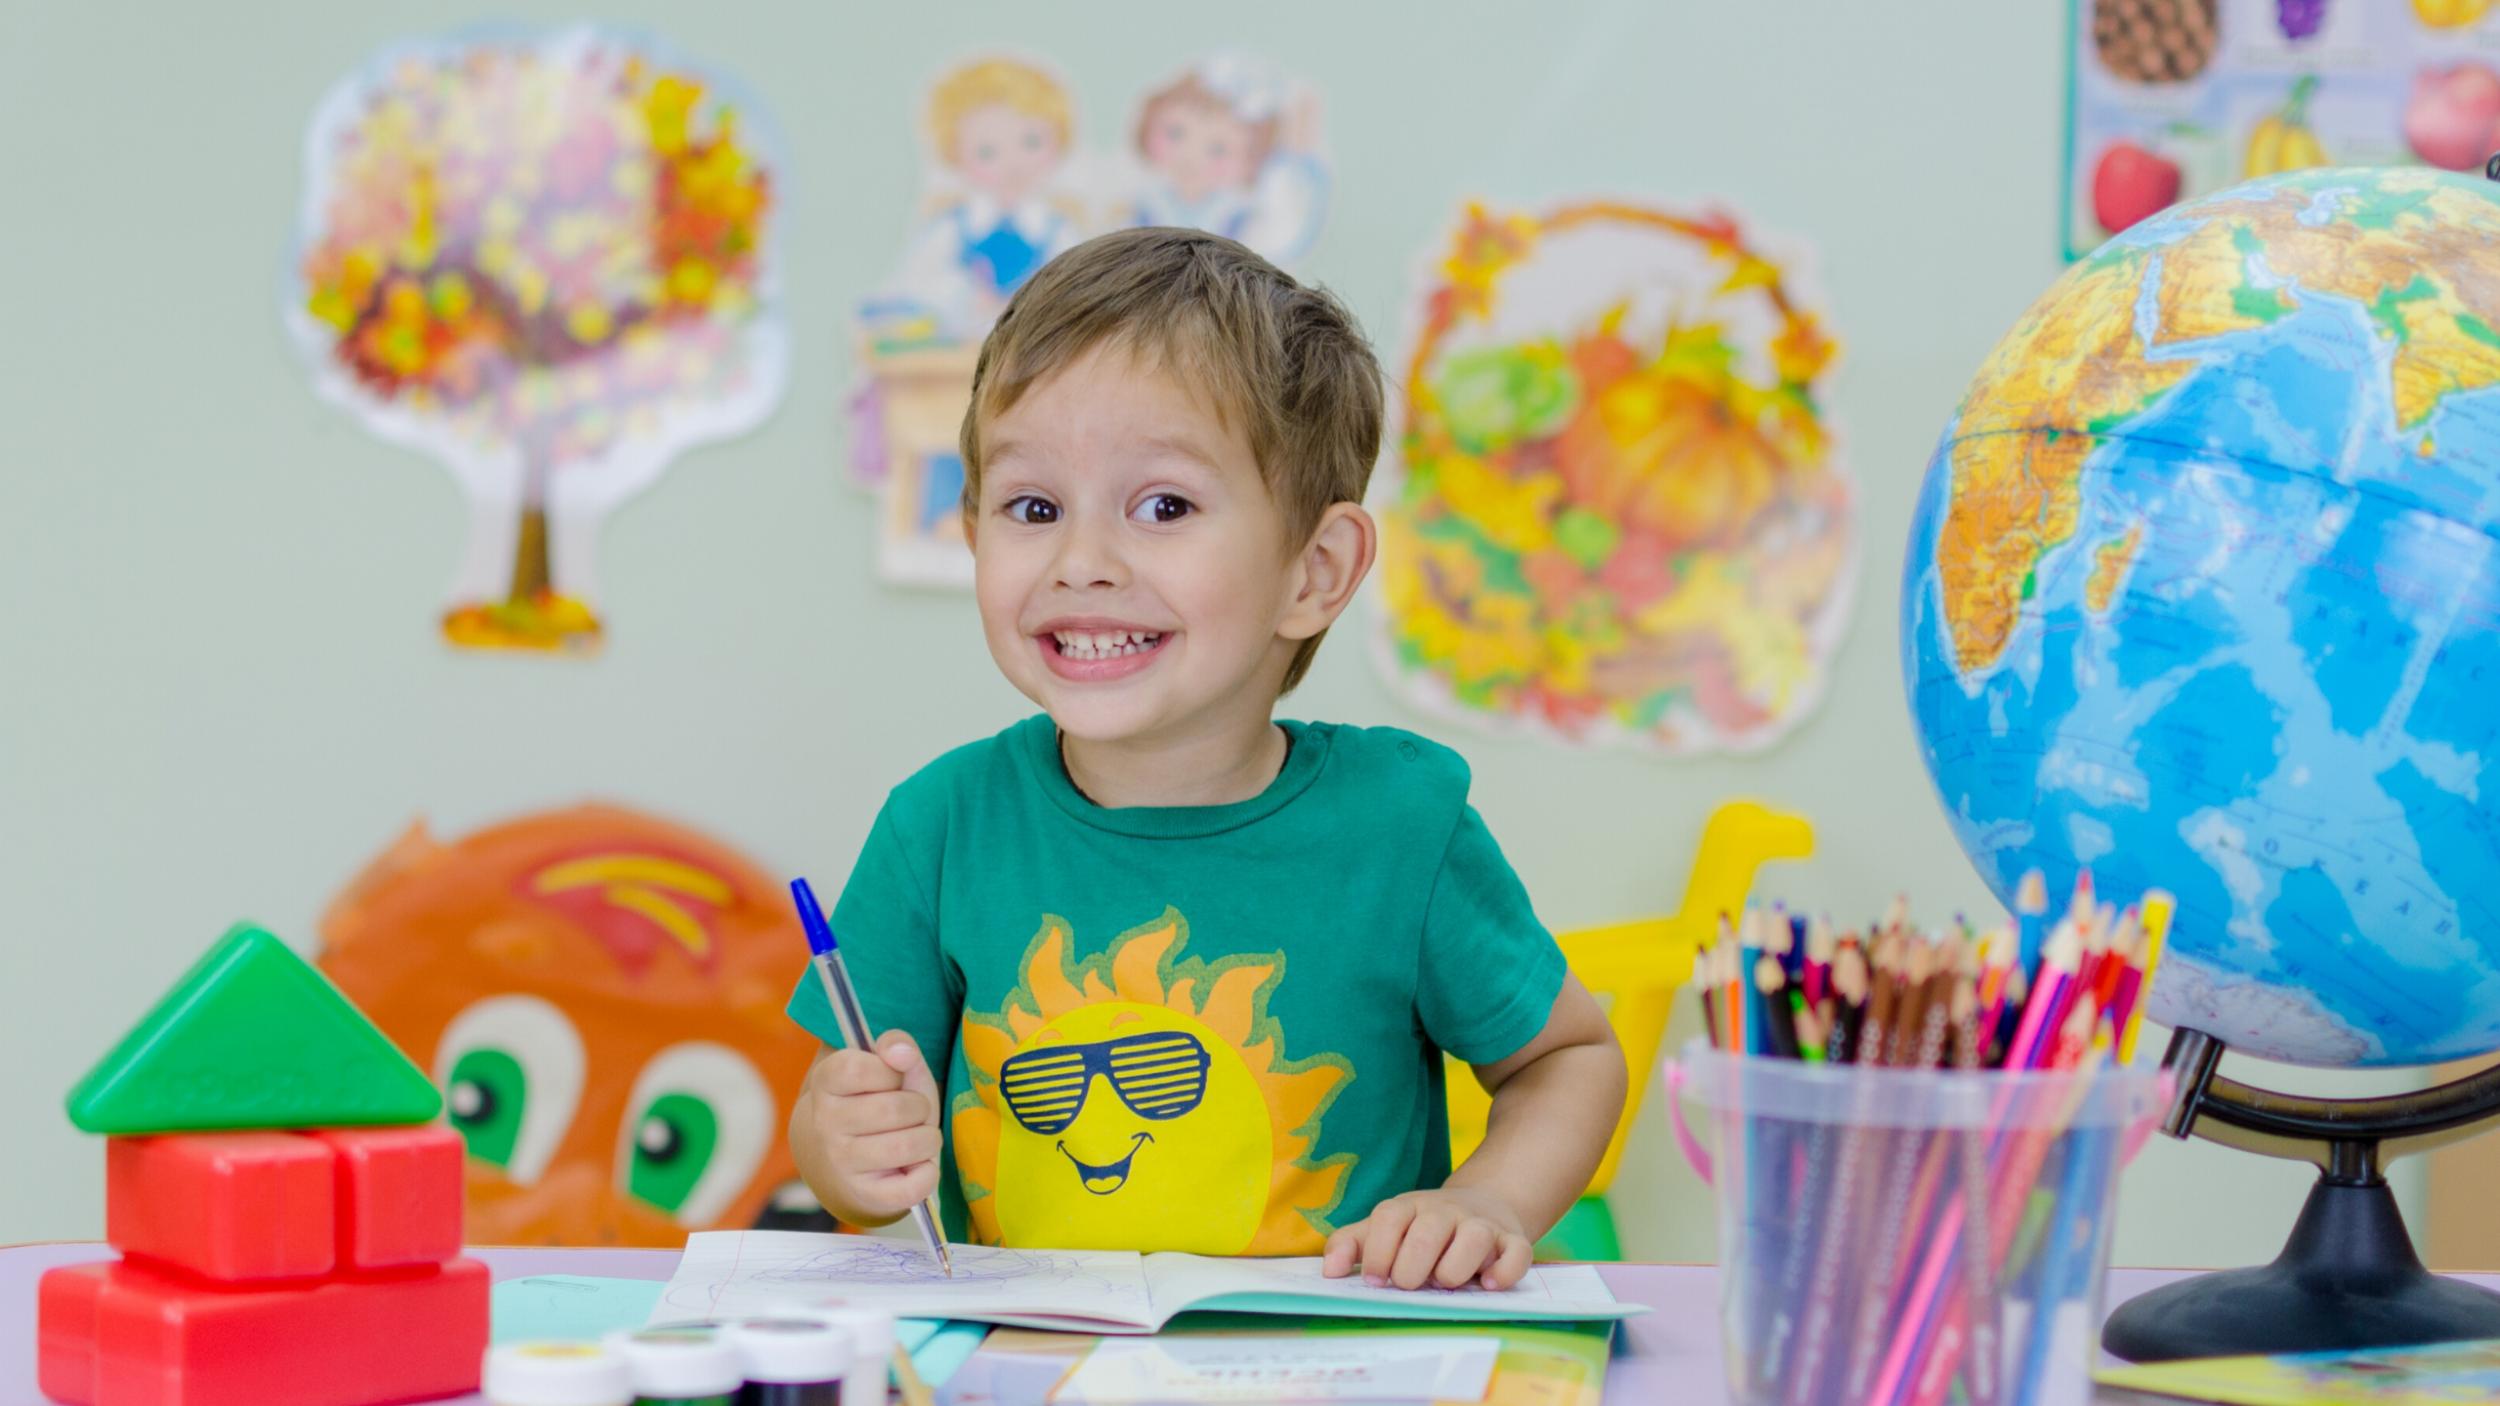 Newsweek AMPLIFY - Homeschooling How to Start